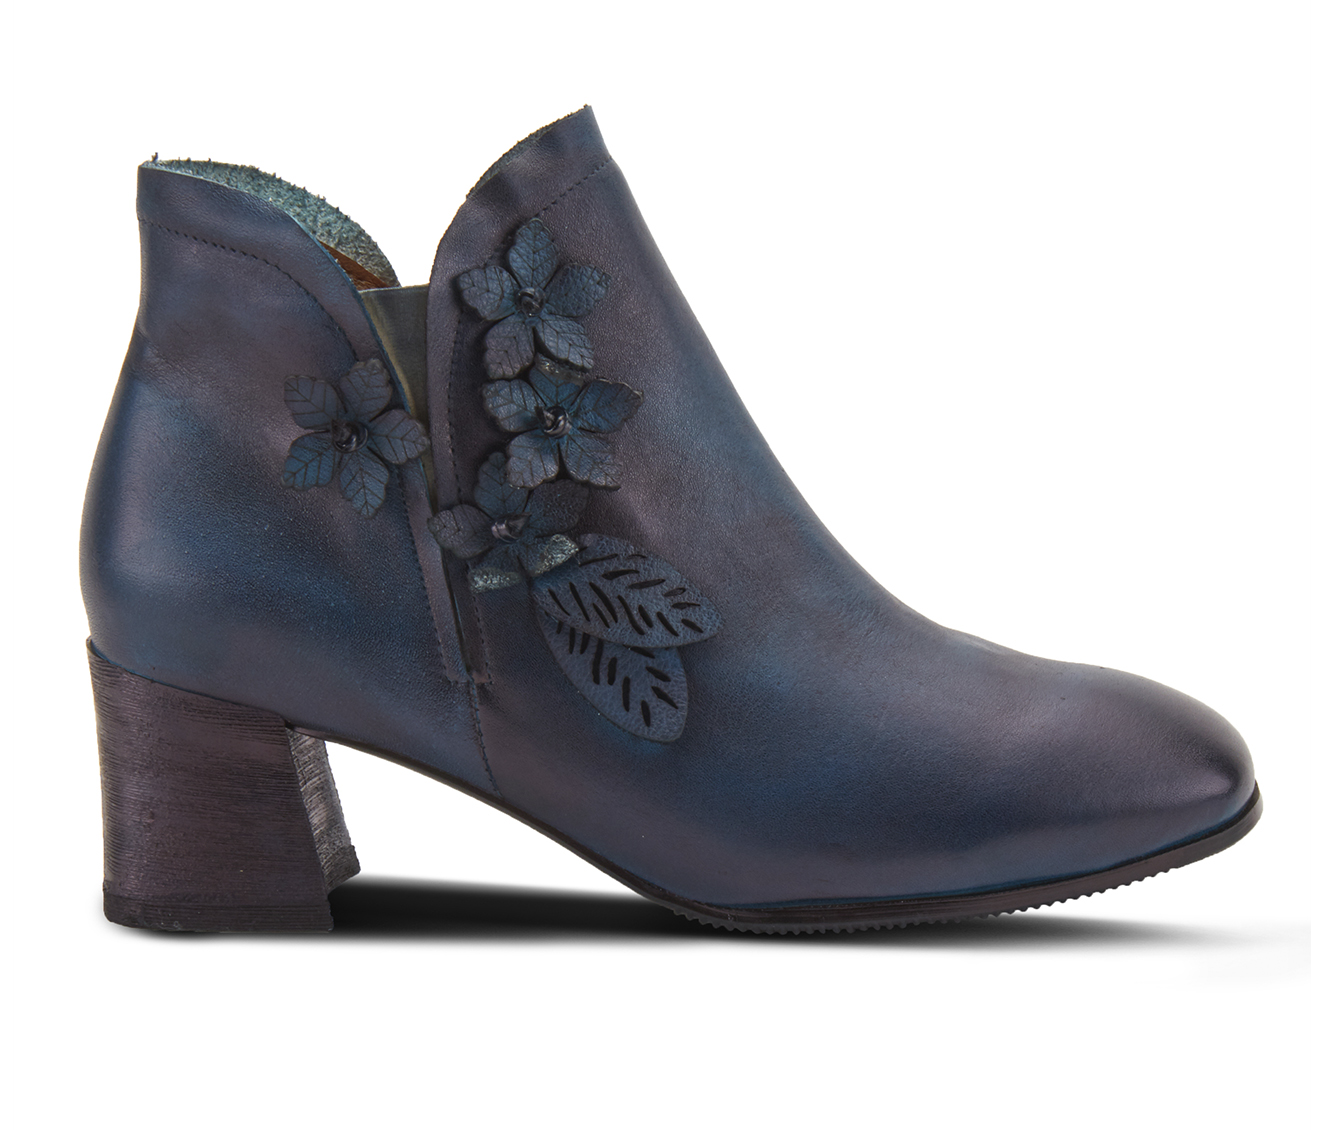 L'Artiste Loralie Women's Boots (Blue Leather)